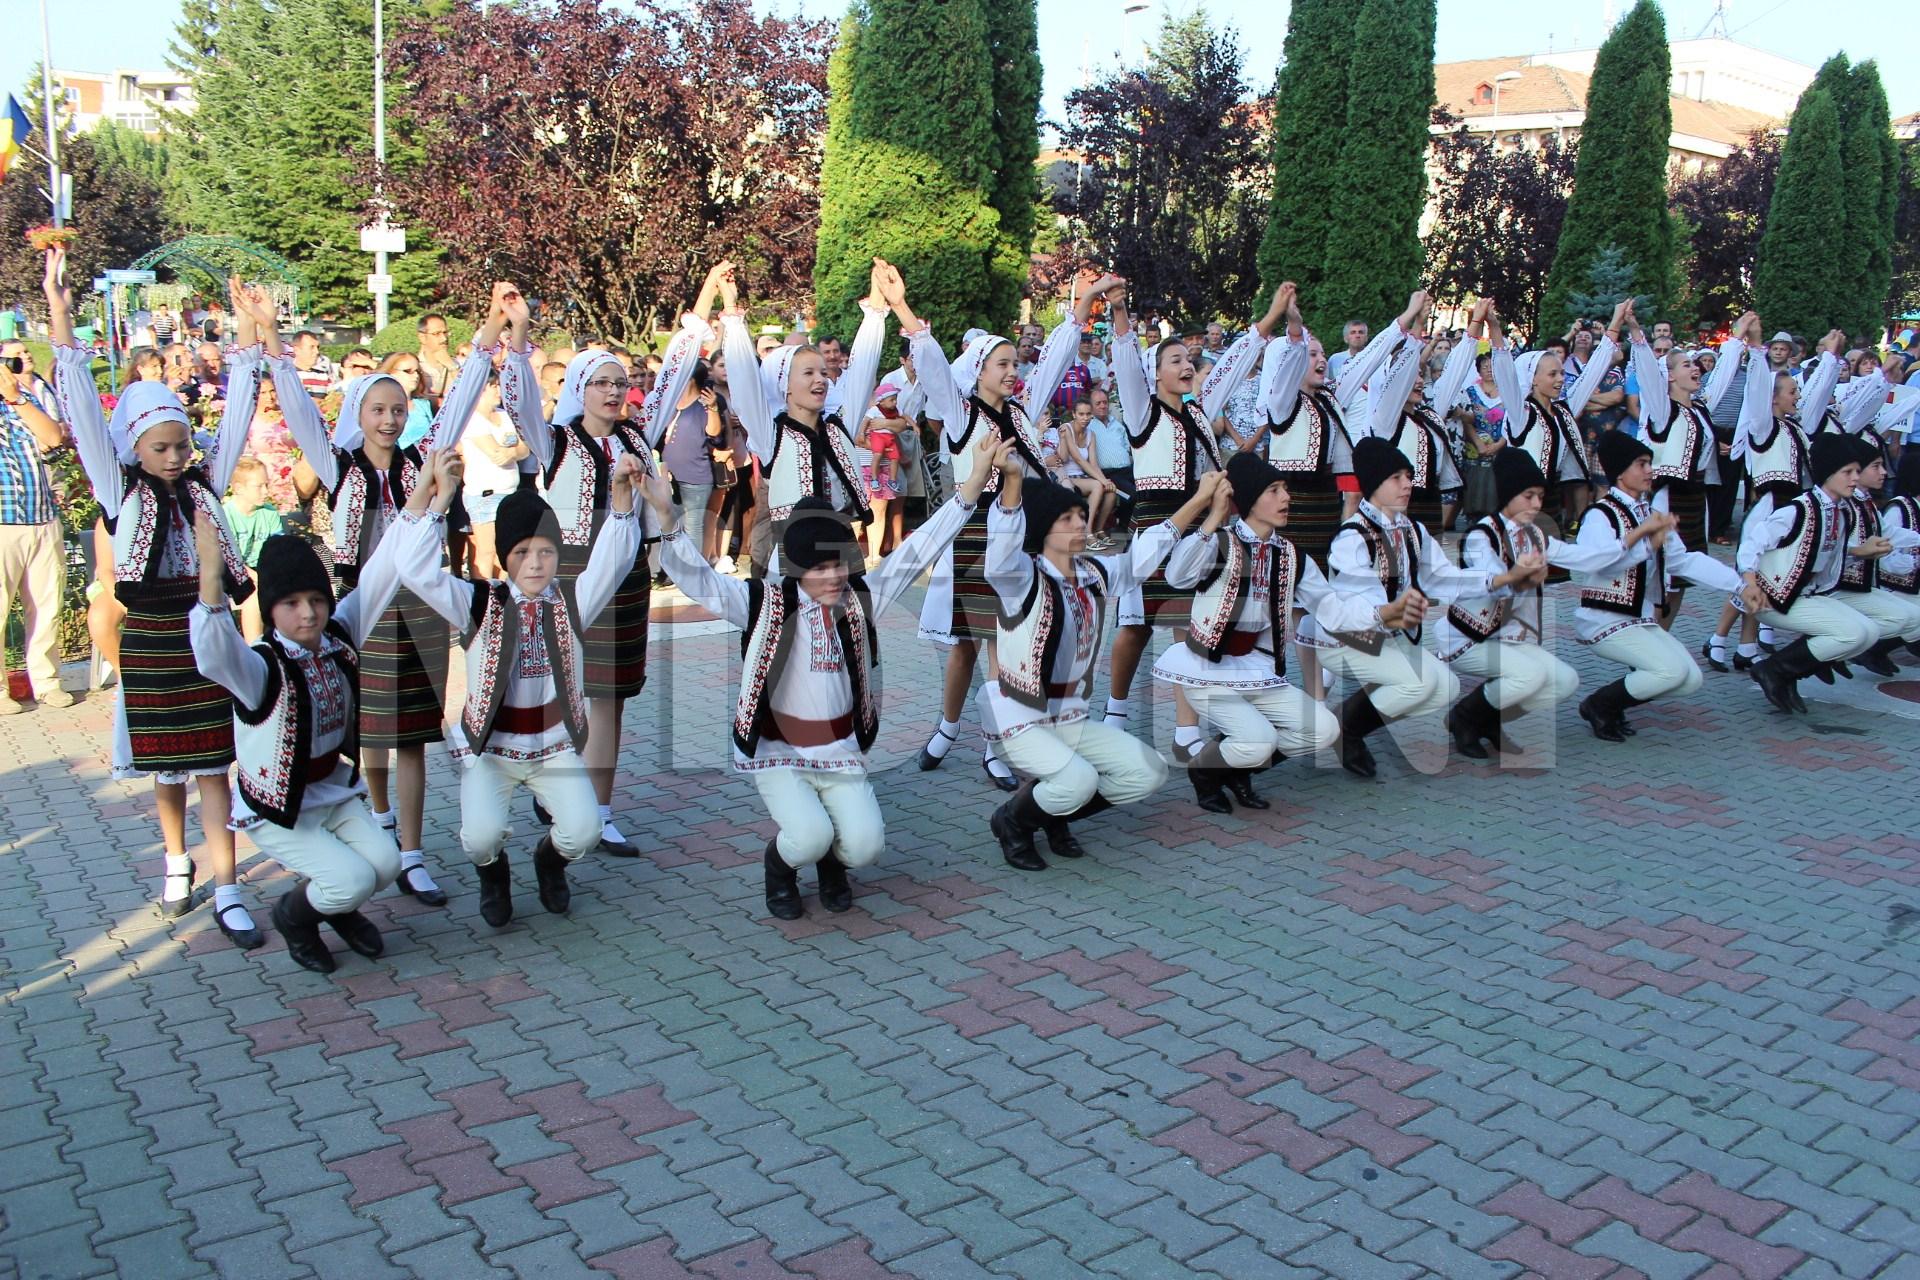 festivalul-carpati-mioveni-august-2017 (32)